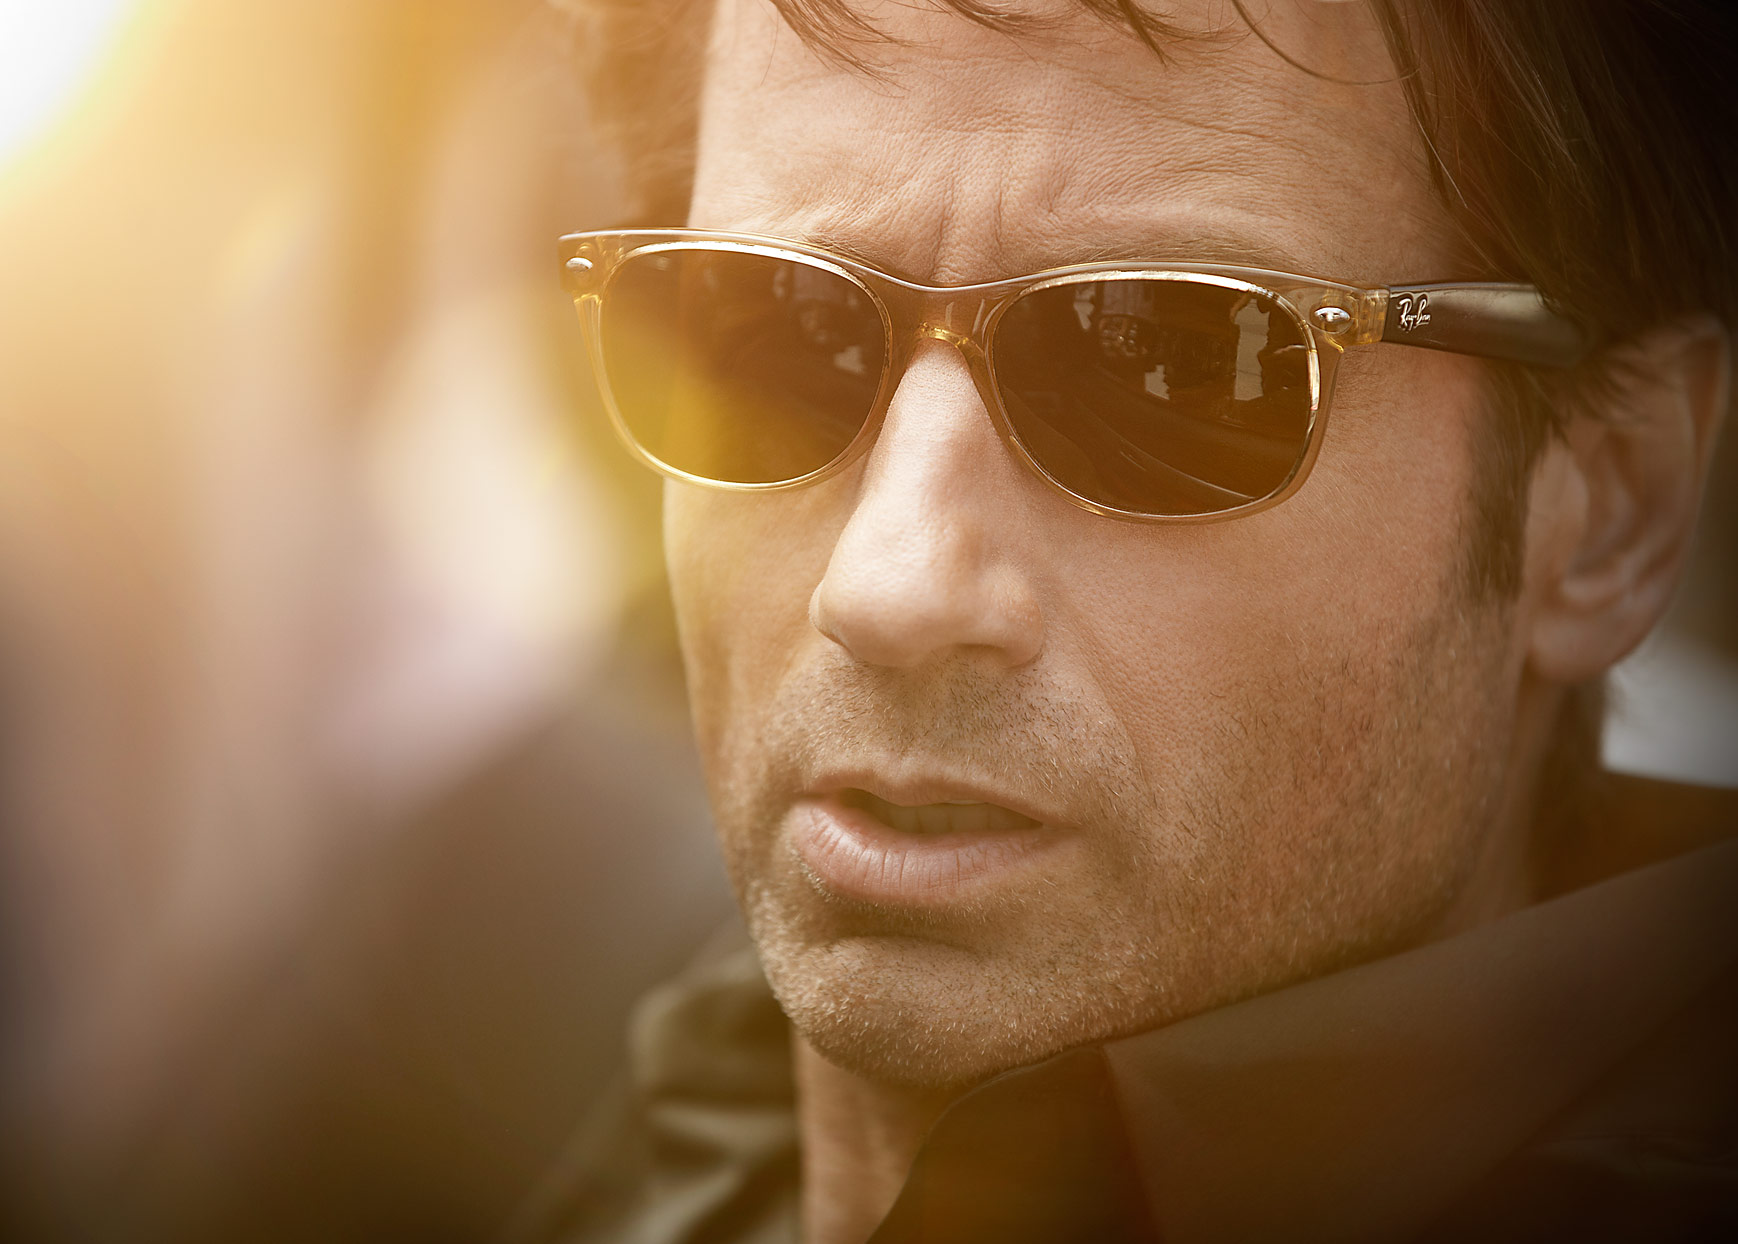 Mark DeLong - Celebrity Photographer - Actor wearing dark shades looks away from light.